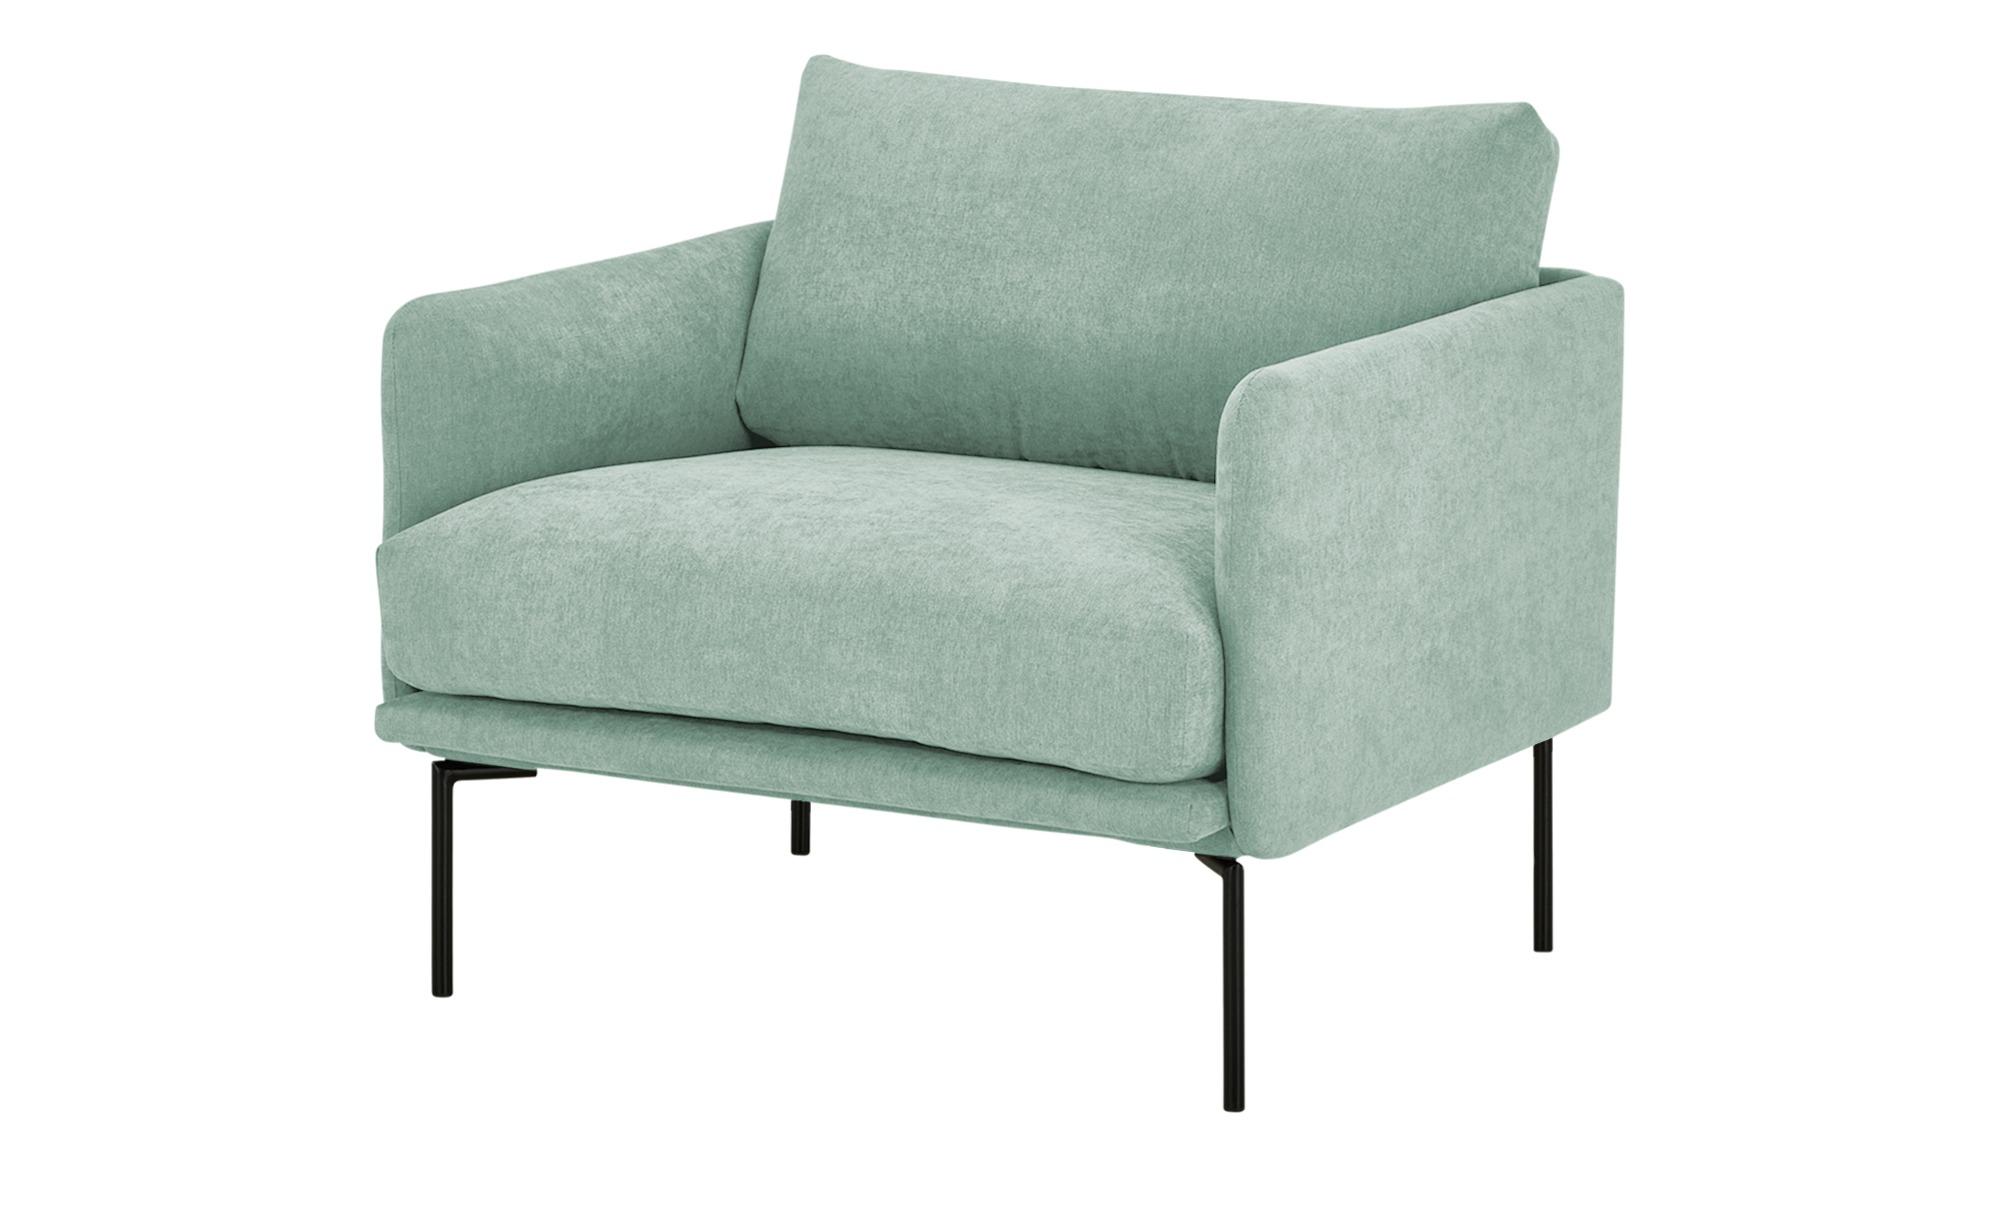 finya Sessel  Nora ¦ grün ¦ Maße (cm): B: 91 H: 78 T: 86 Polstermöbel > Sessel > Polstersessel - Höffner